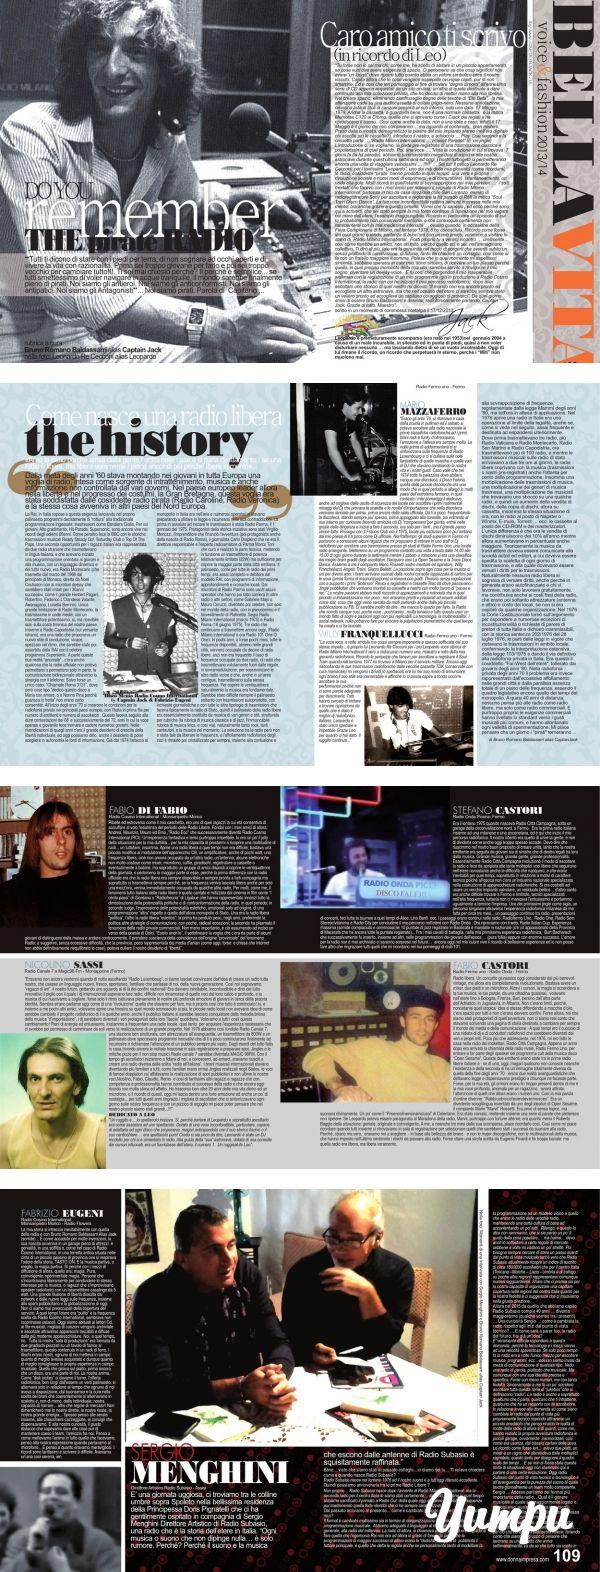 Donna Impresa Magazine Bella Vita: Do you remenber the pirate radio? tutto su http://www.donnaimpresa.com - Magazine with 6 pages: remember Magazine with 6 Pages from captainjack